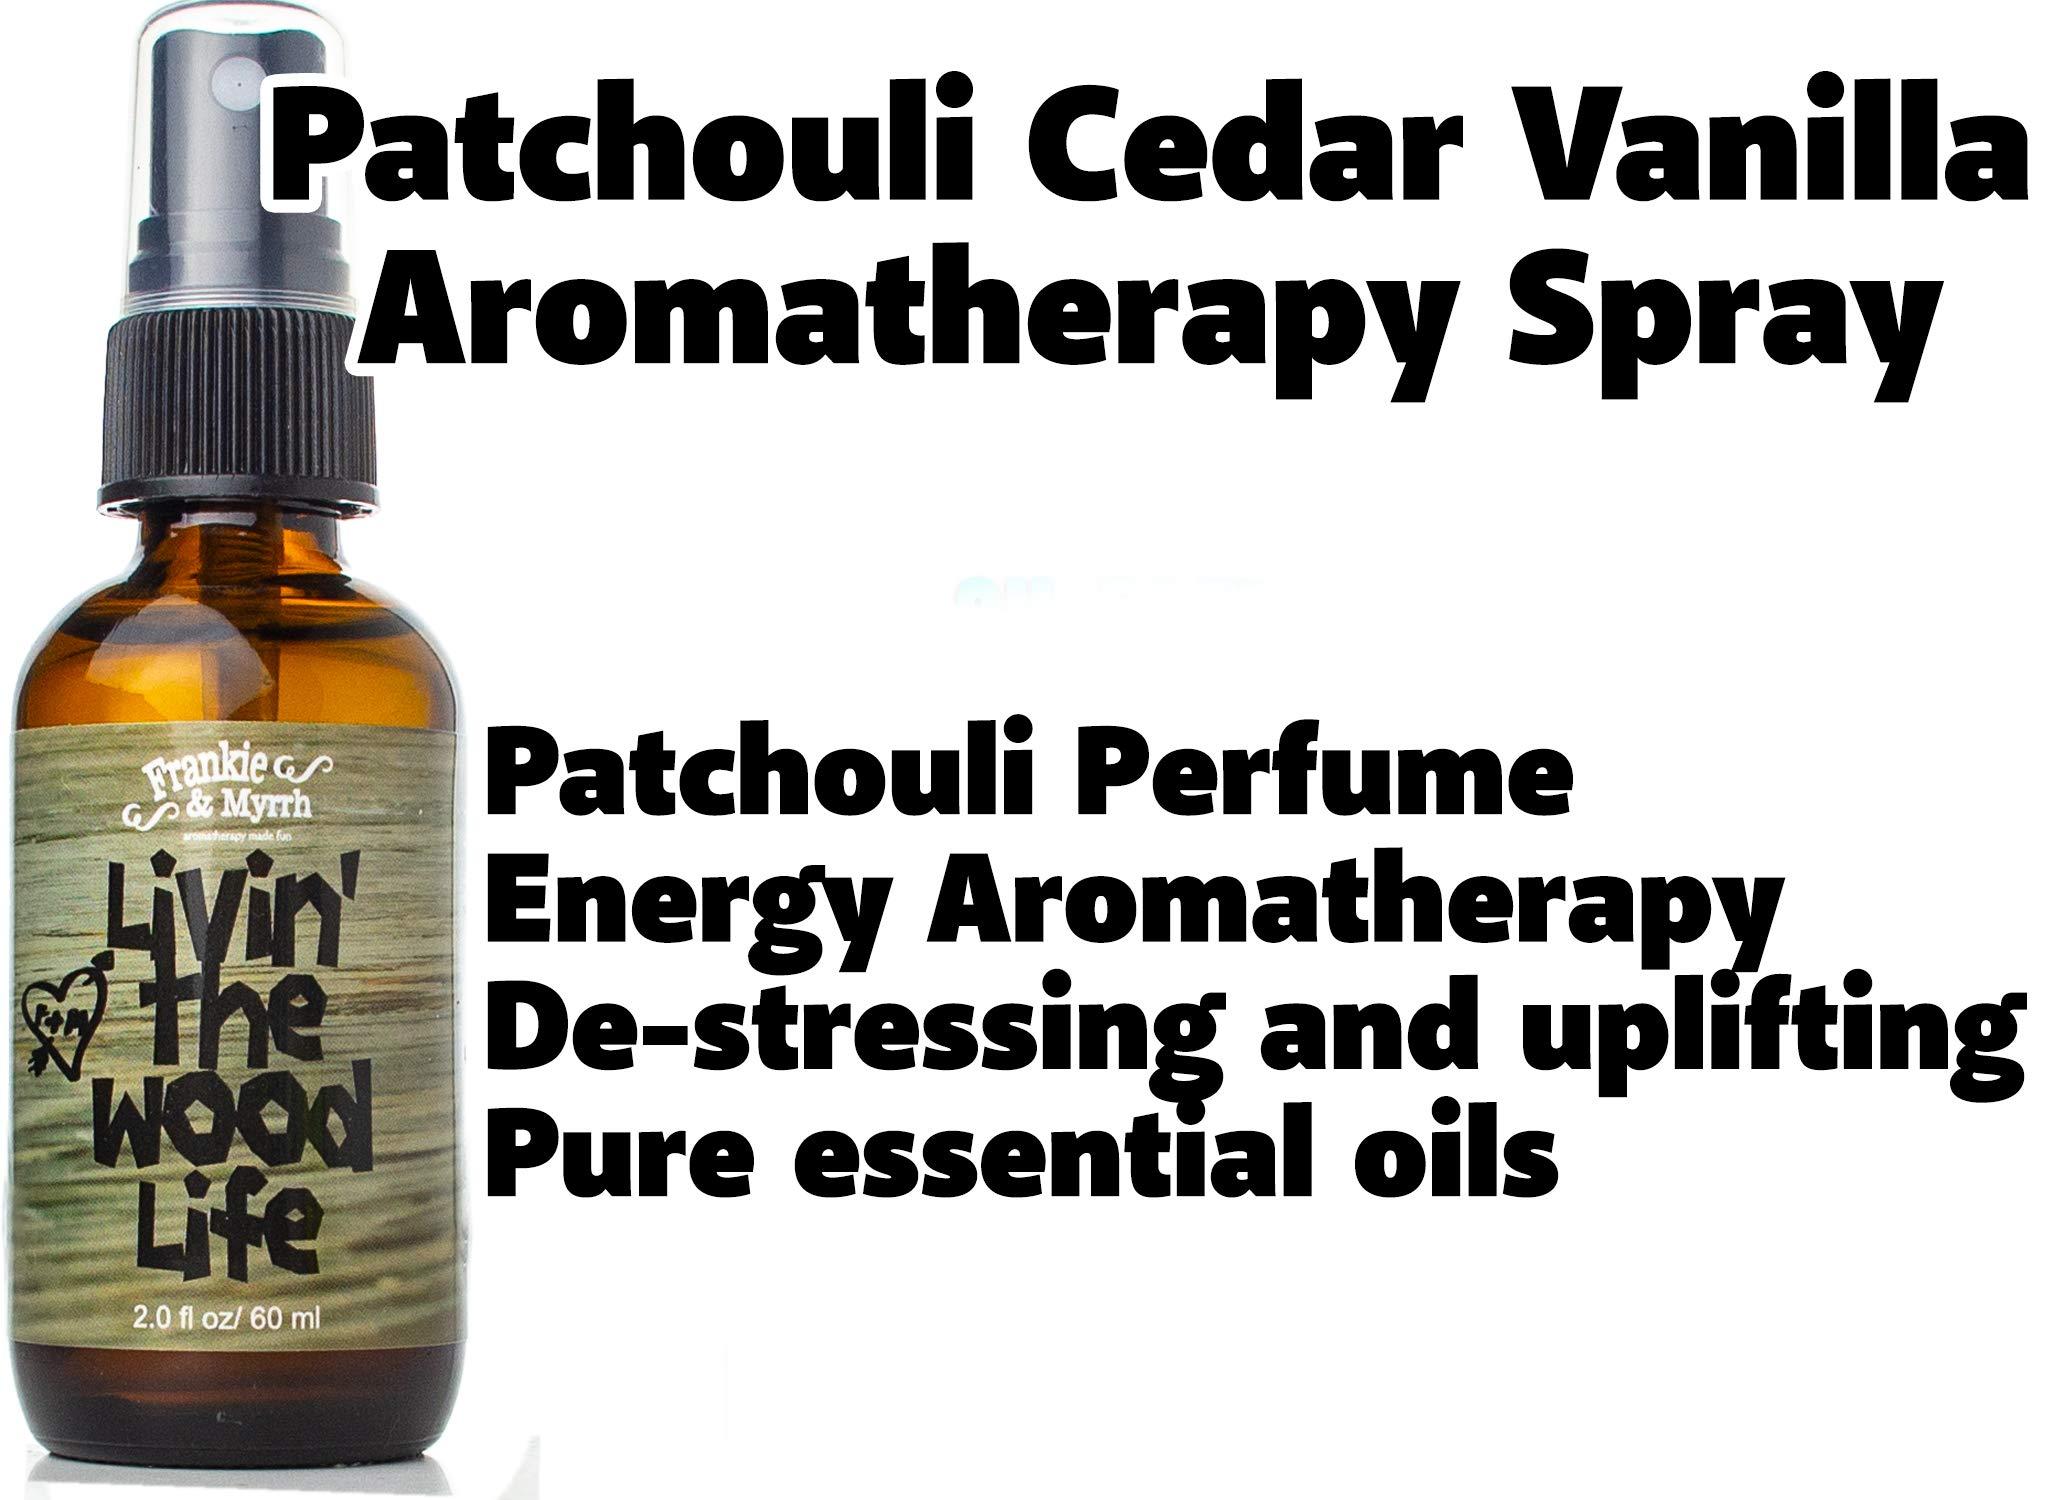 Livin' The Wood Life | Patchouli Cedar Vanilla Natural Perfume/Cologne | Aromatherapy Spray by Frankie and Myrrh (Image #2)